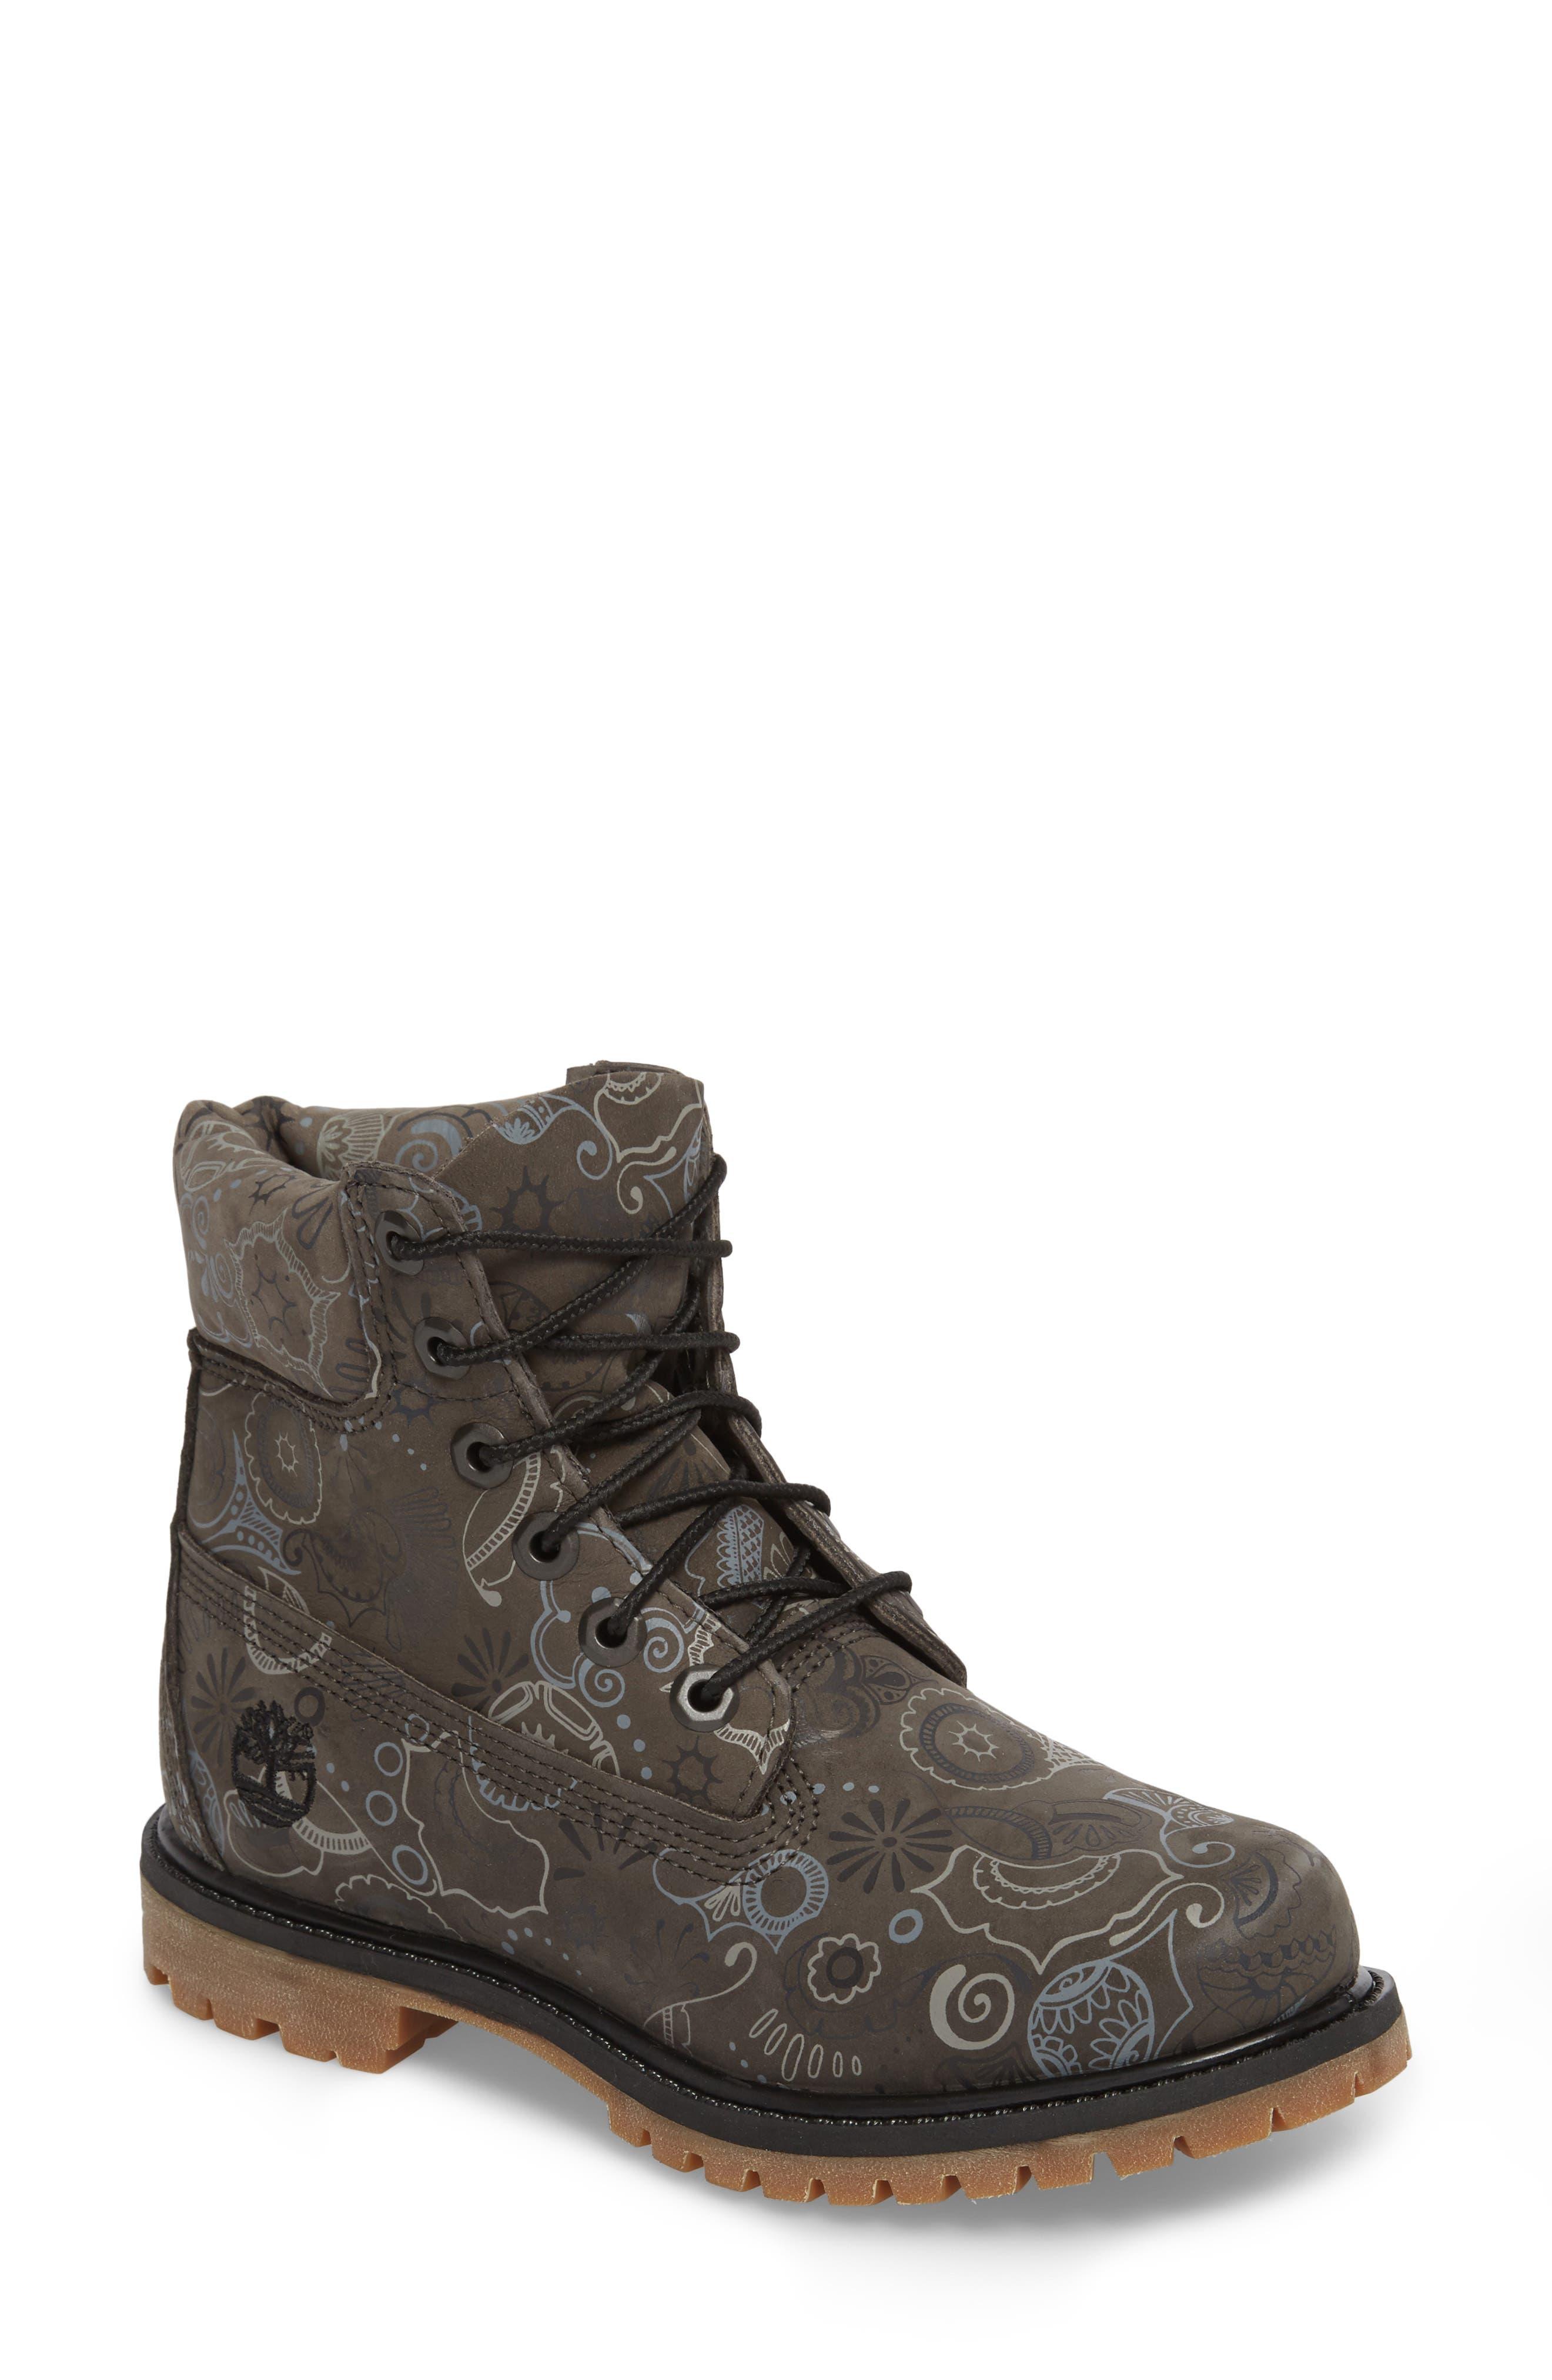 Henna Premium Boot,                         Main,                         color, 065